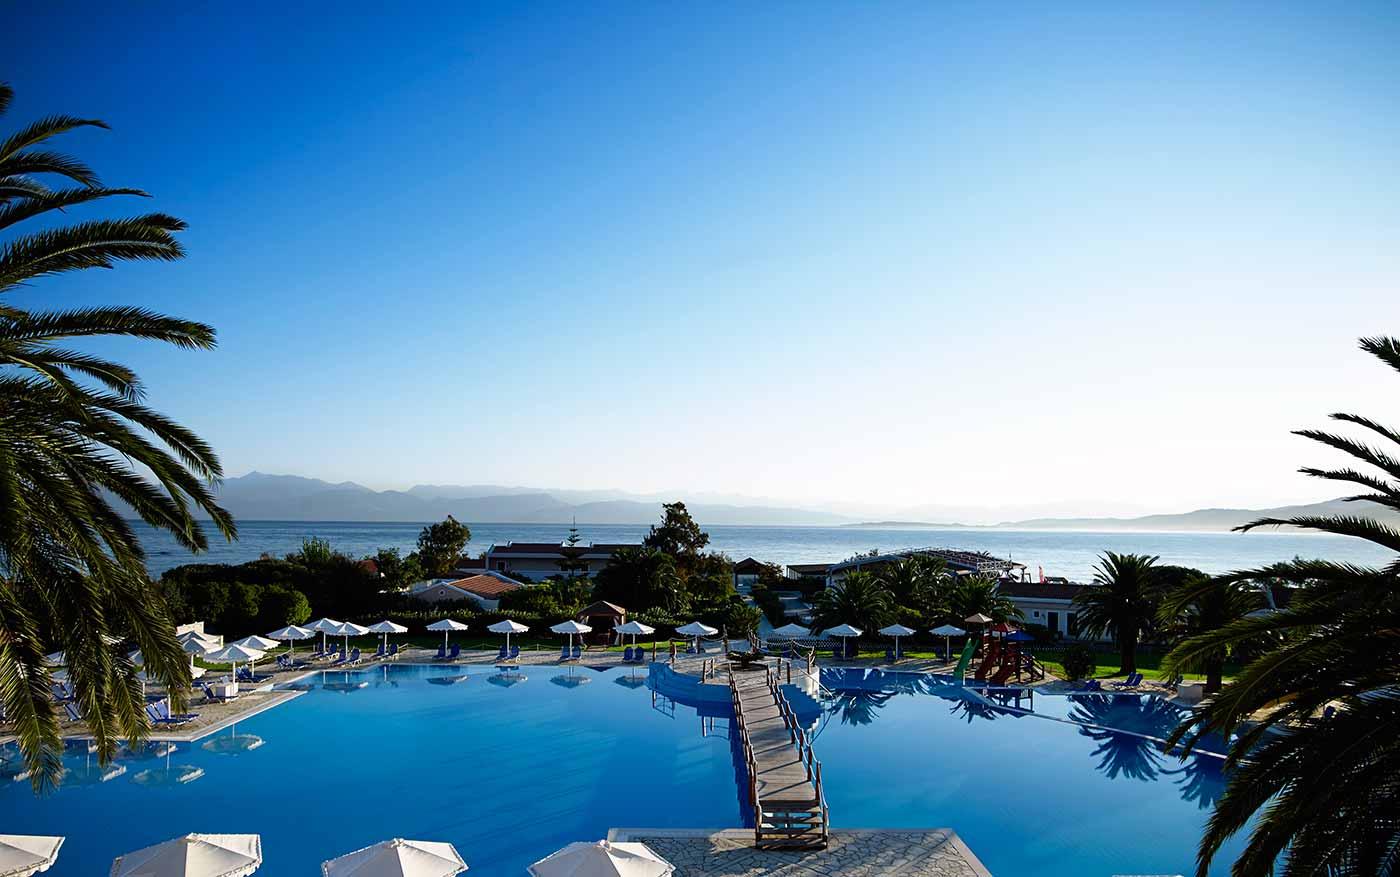 Roda beach resort and Spa, Corfu island, Greece | Niakas Travel